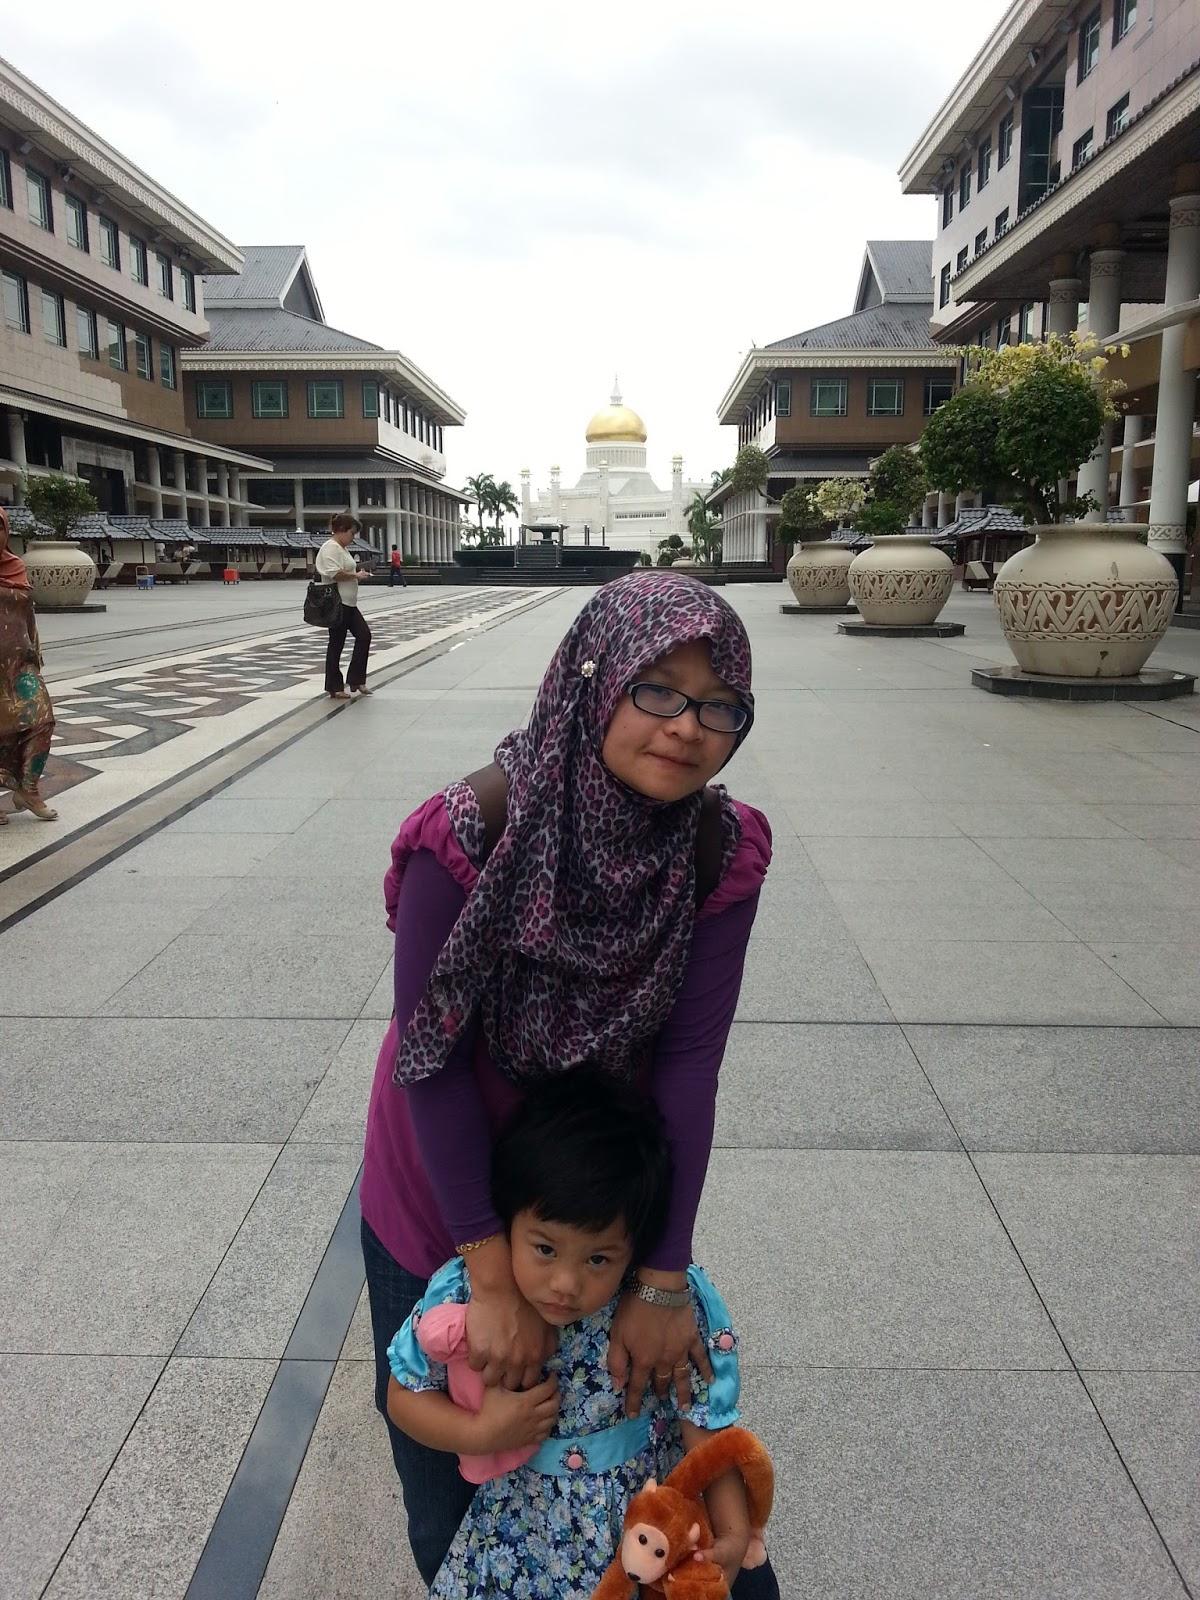 http://www.khairunnisahamdan.com/2015/03/trip-to-bruneikompleks-yayasan-sultan.html